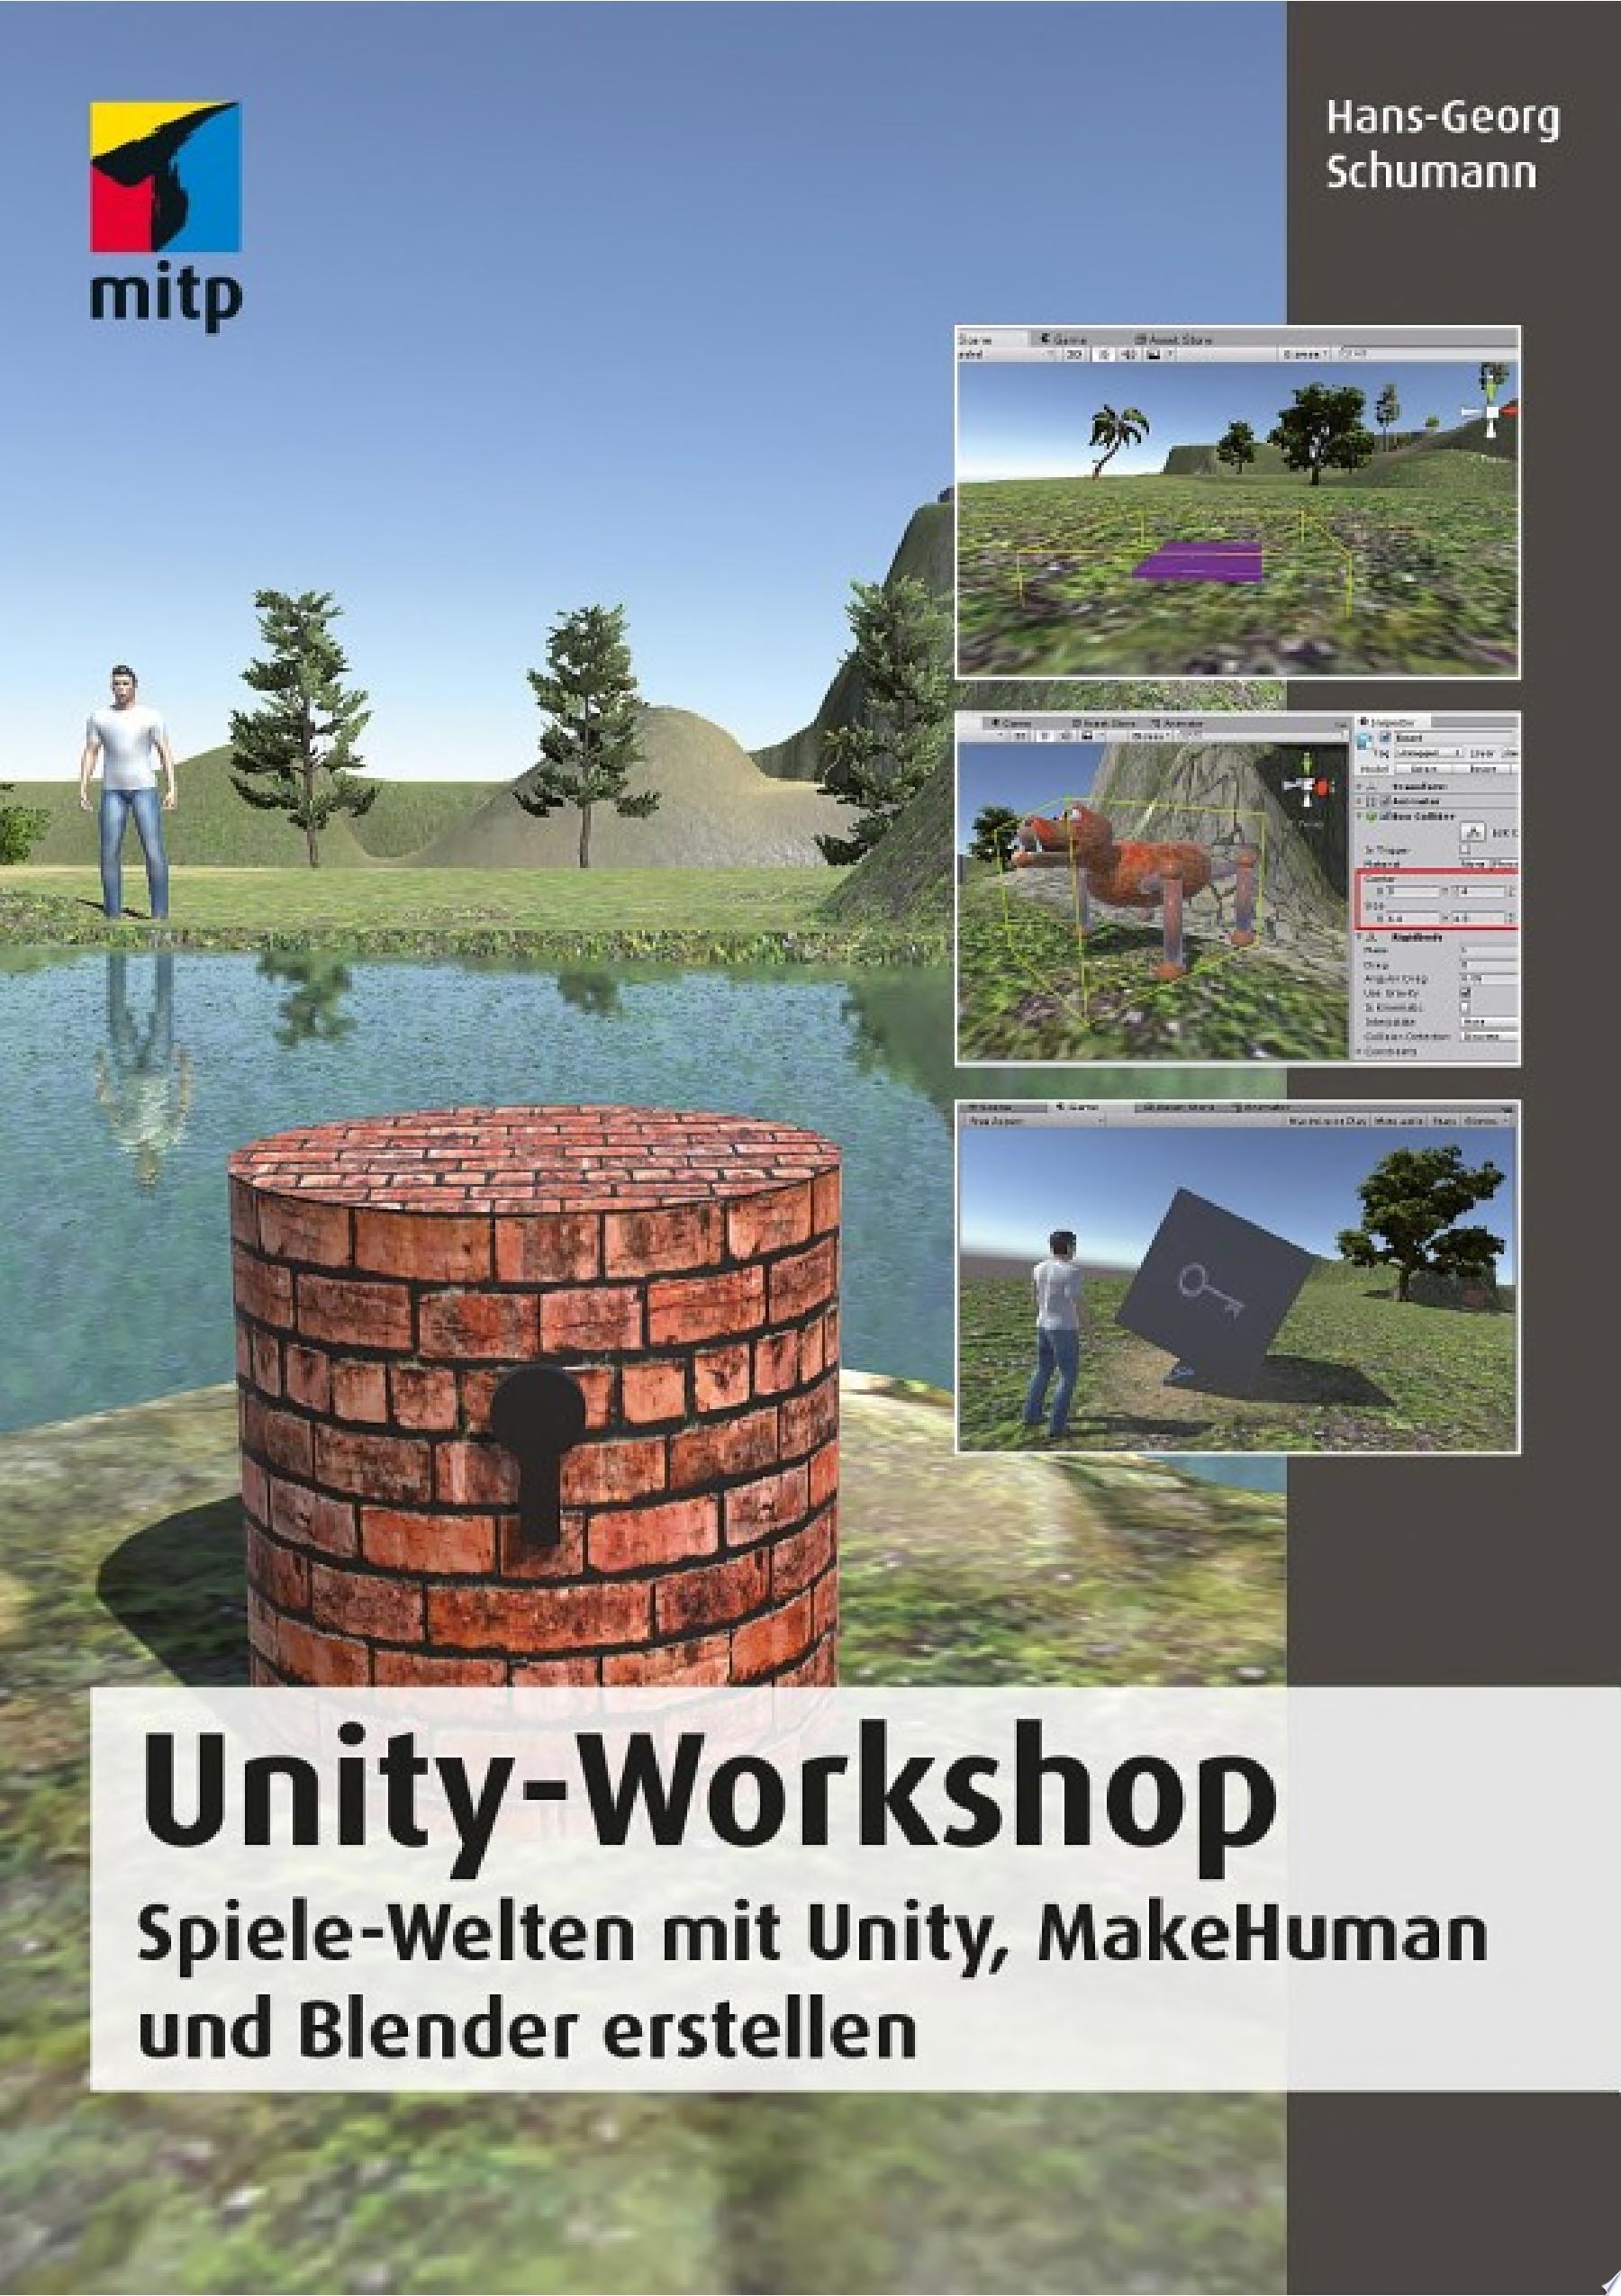 Unity Workshop